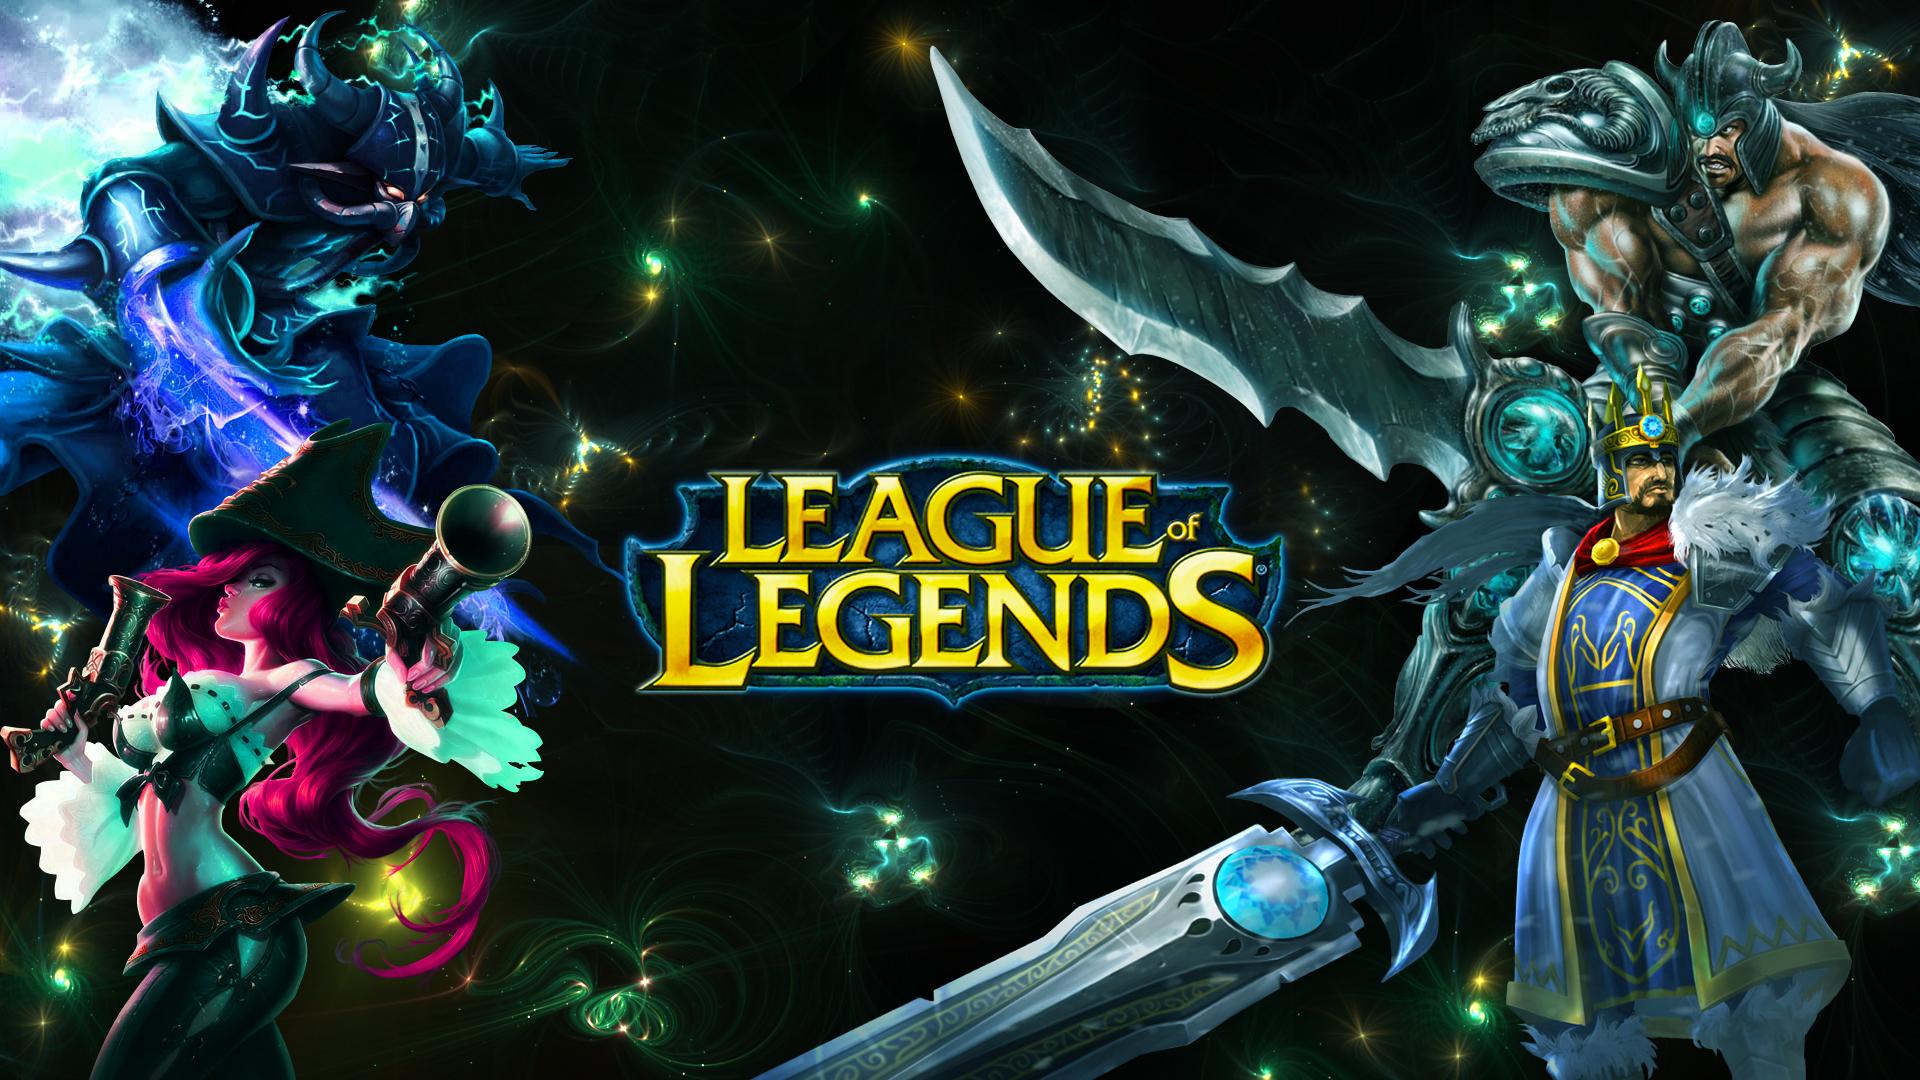 League of Legends wallpaper 84